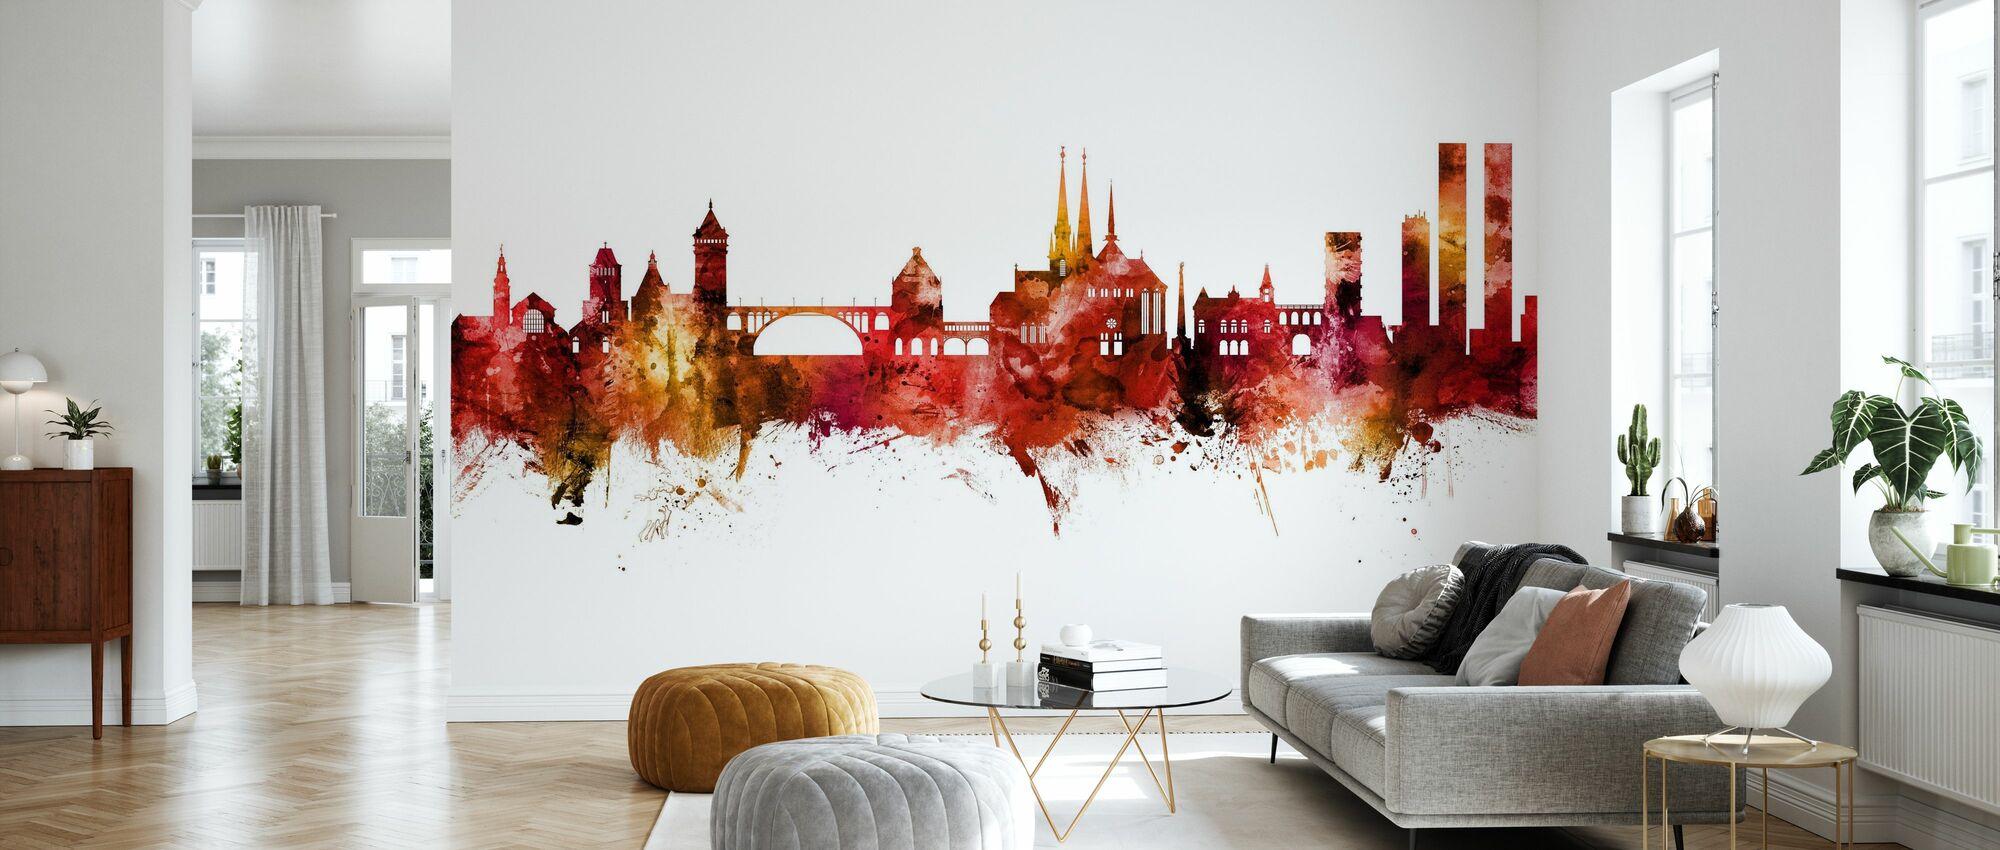 Luxembourg City Skyline - Wallpaper - Living Room